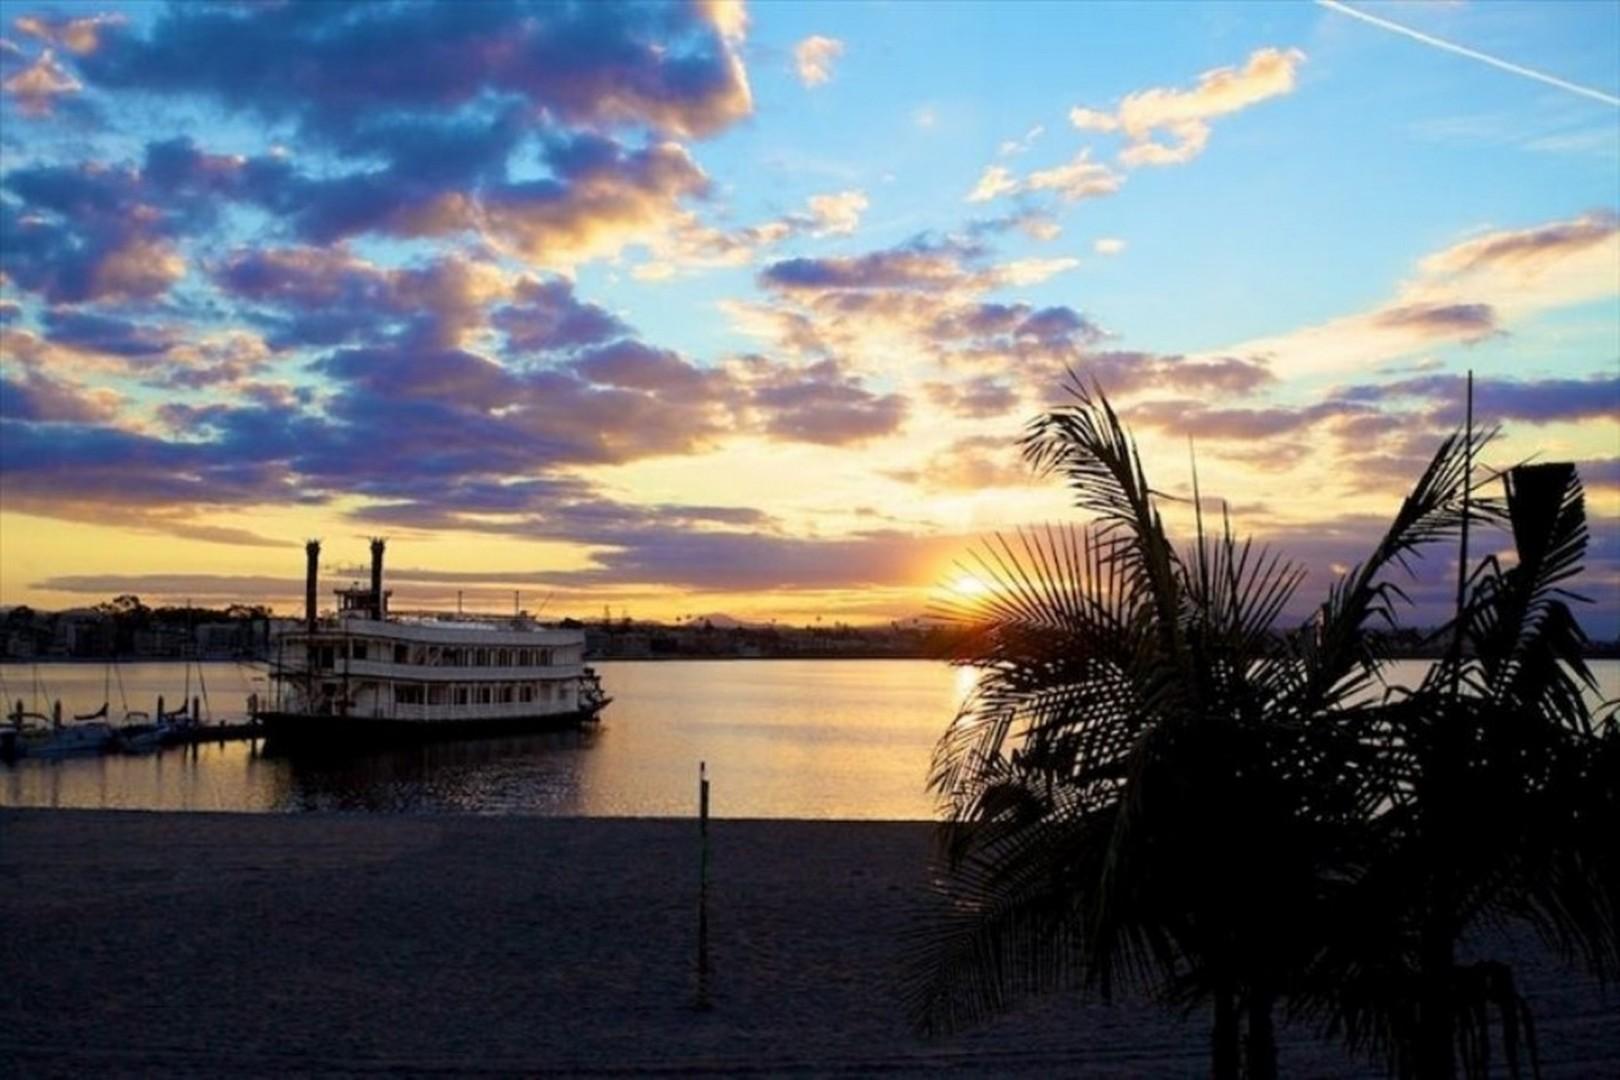 Villa_on_the_Bay_Beach_2100x1400